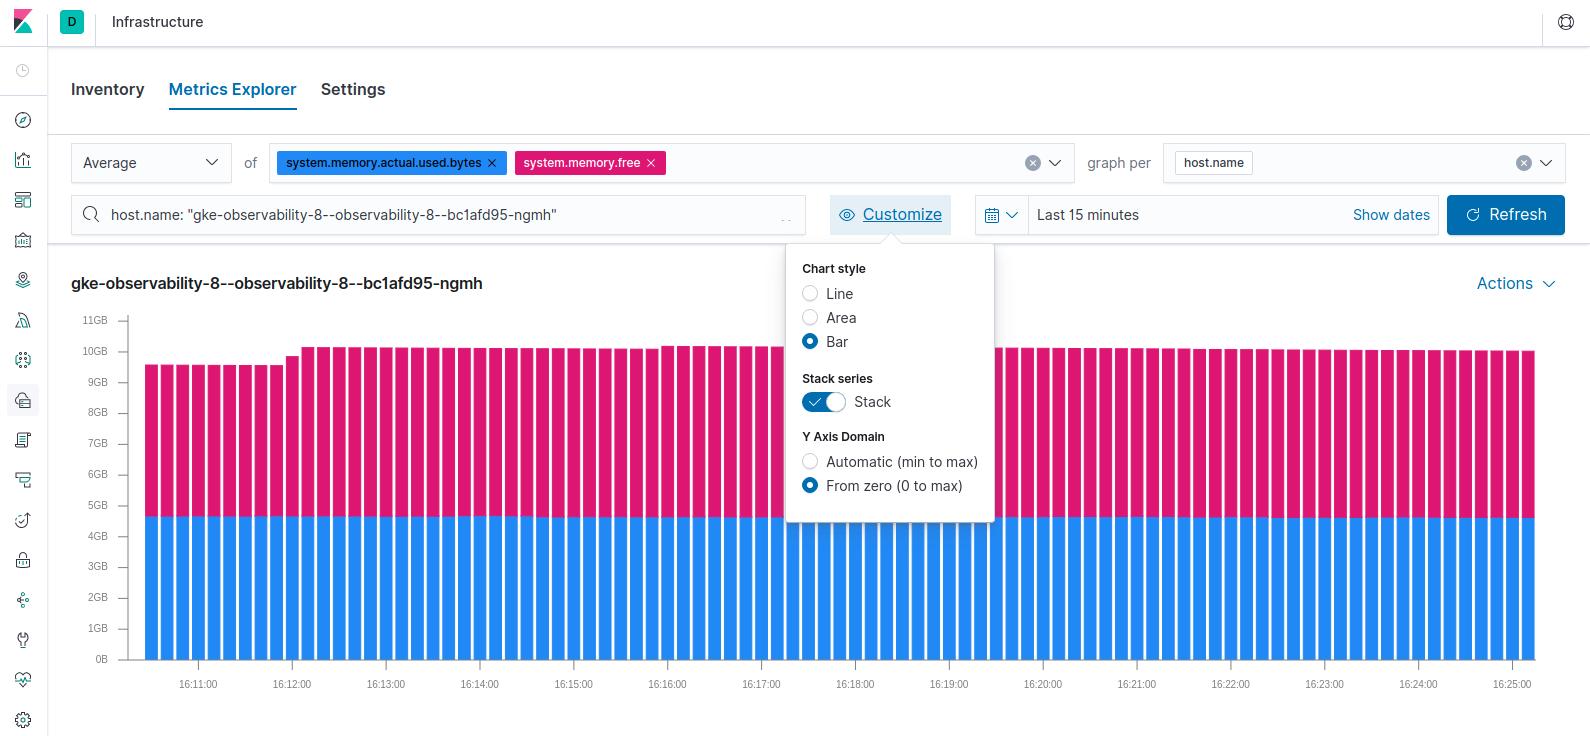 Metrics visualized in bar charts